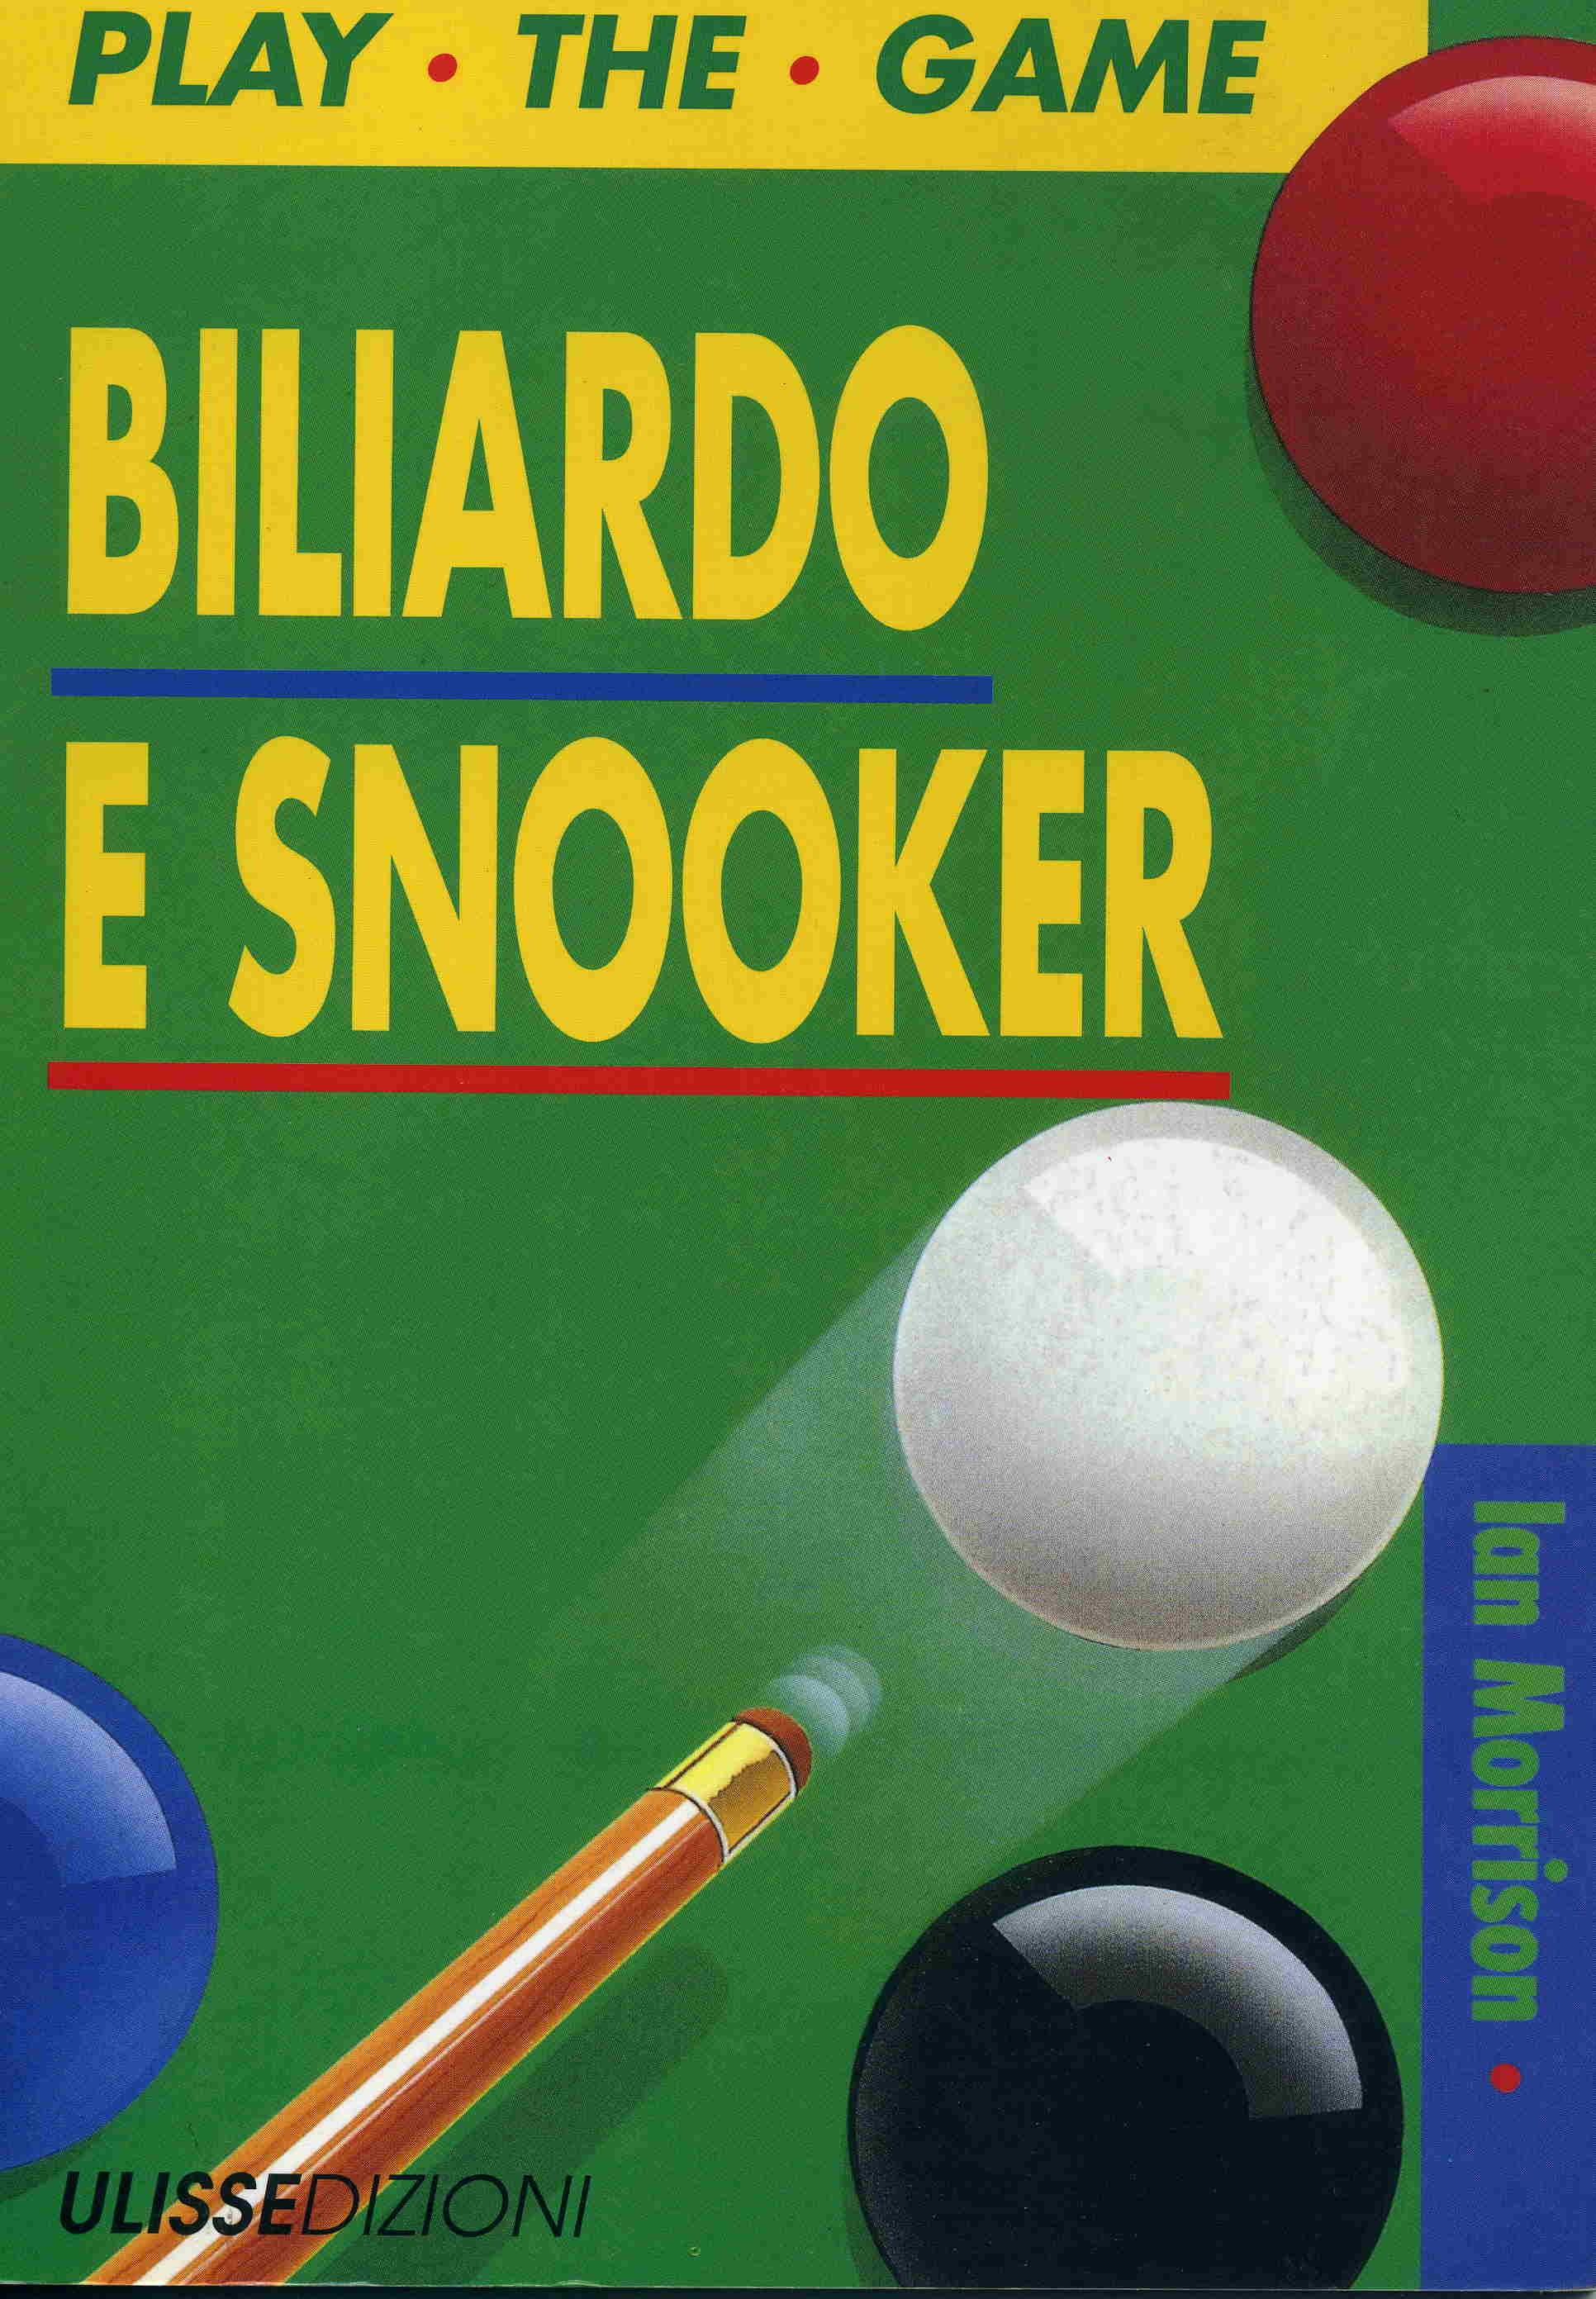 Biliardo e snooker